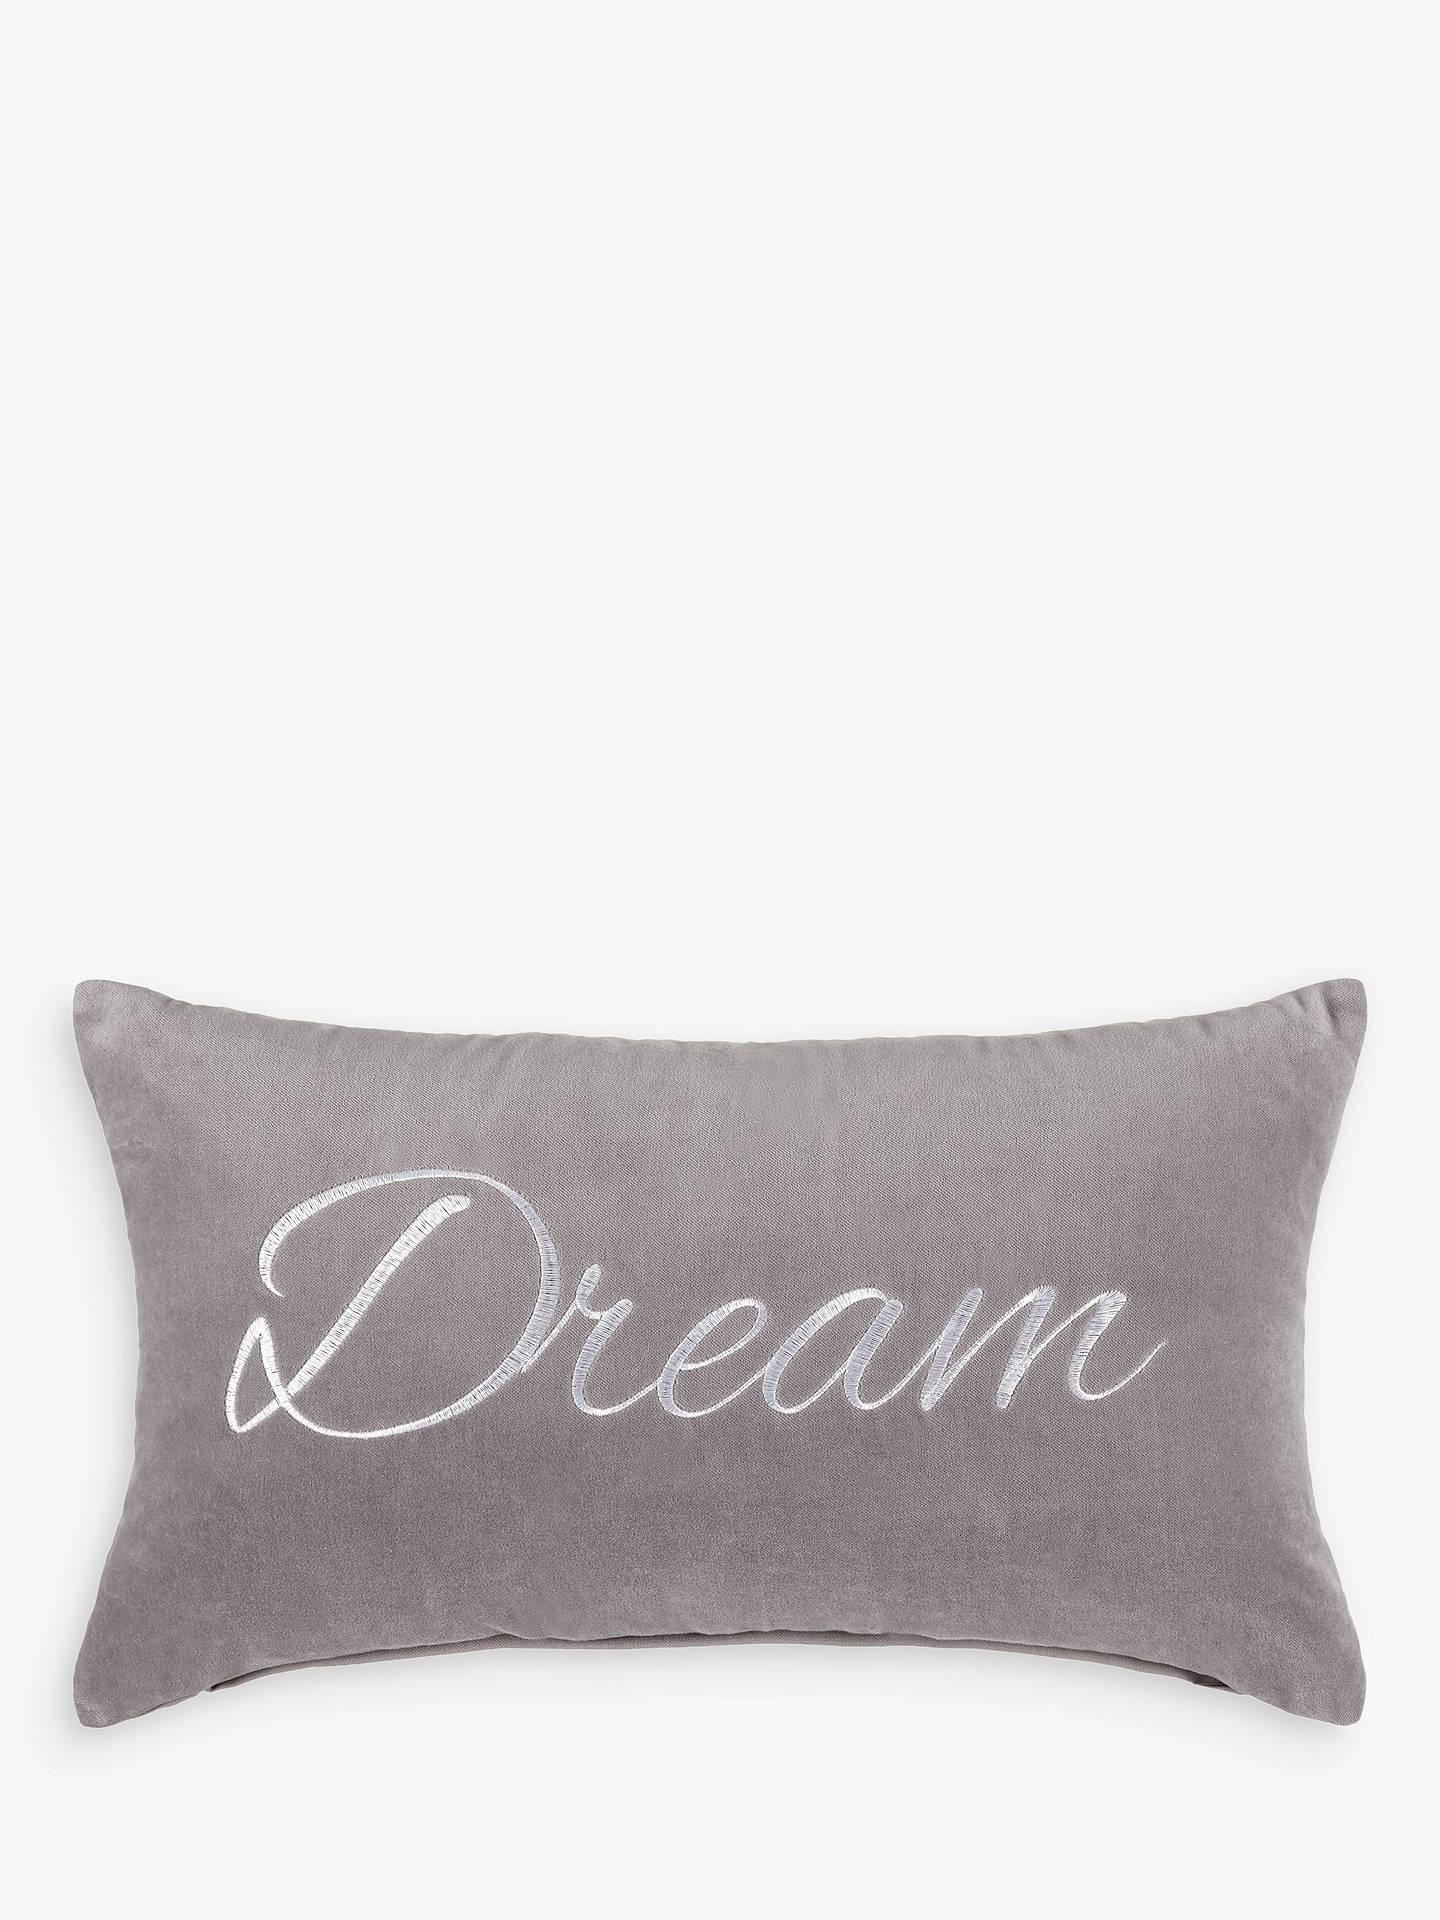 john lewis partners dream cushion at john lewis partners. Black Bedroom Furniture Sets. Home Design Ideas